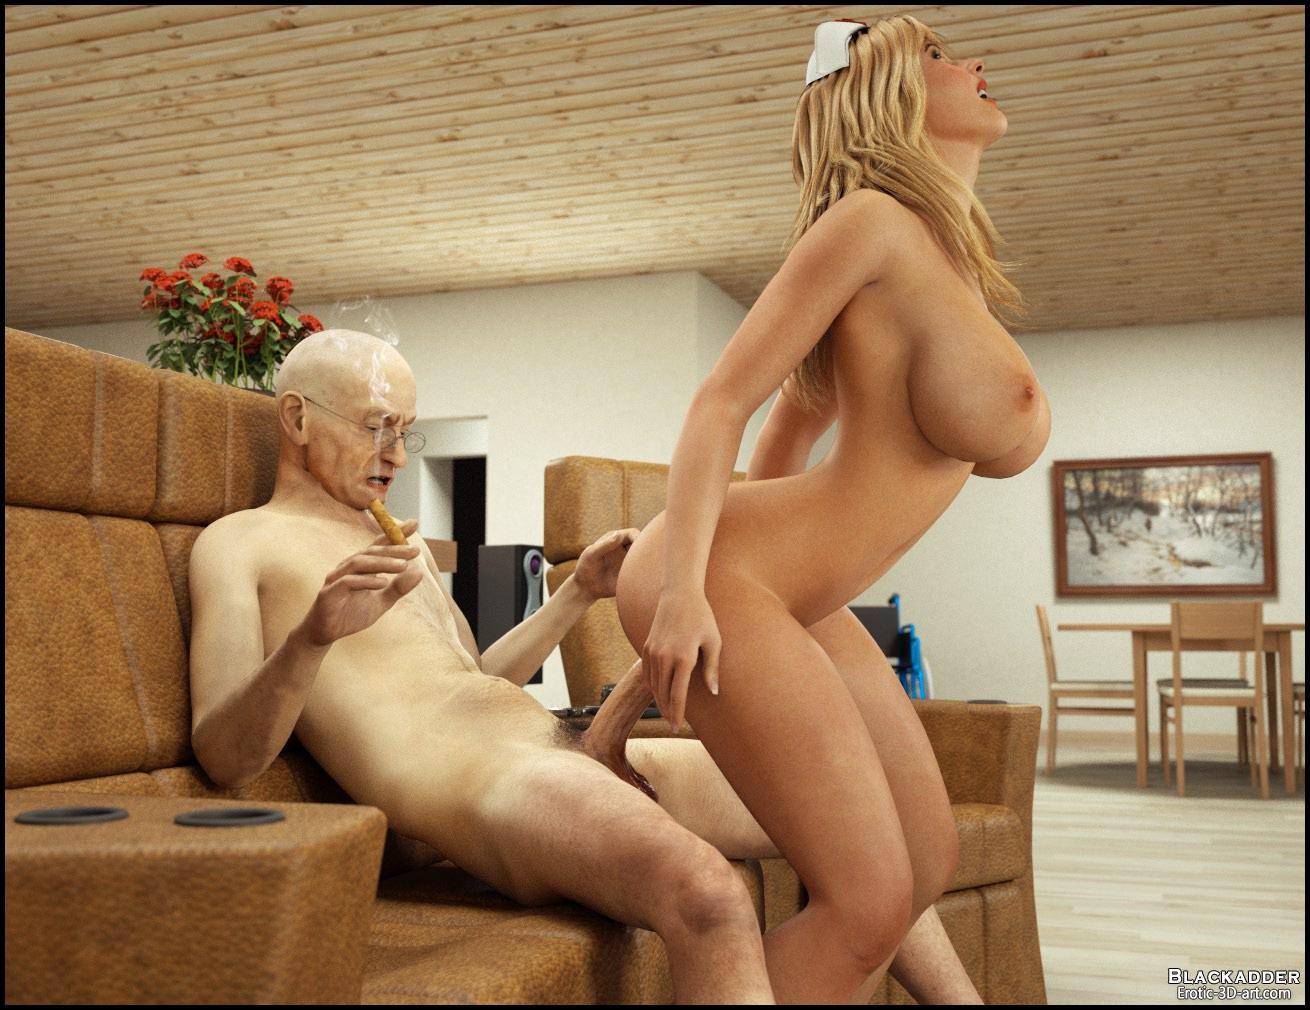 Смотреть онлайн порно медсестер со стариками бесплатно фото 243-431